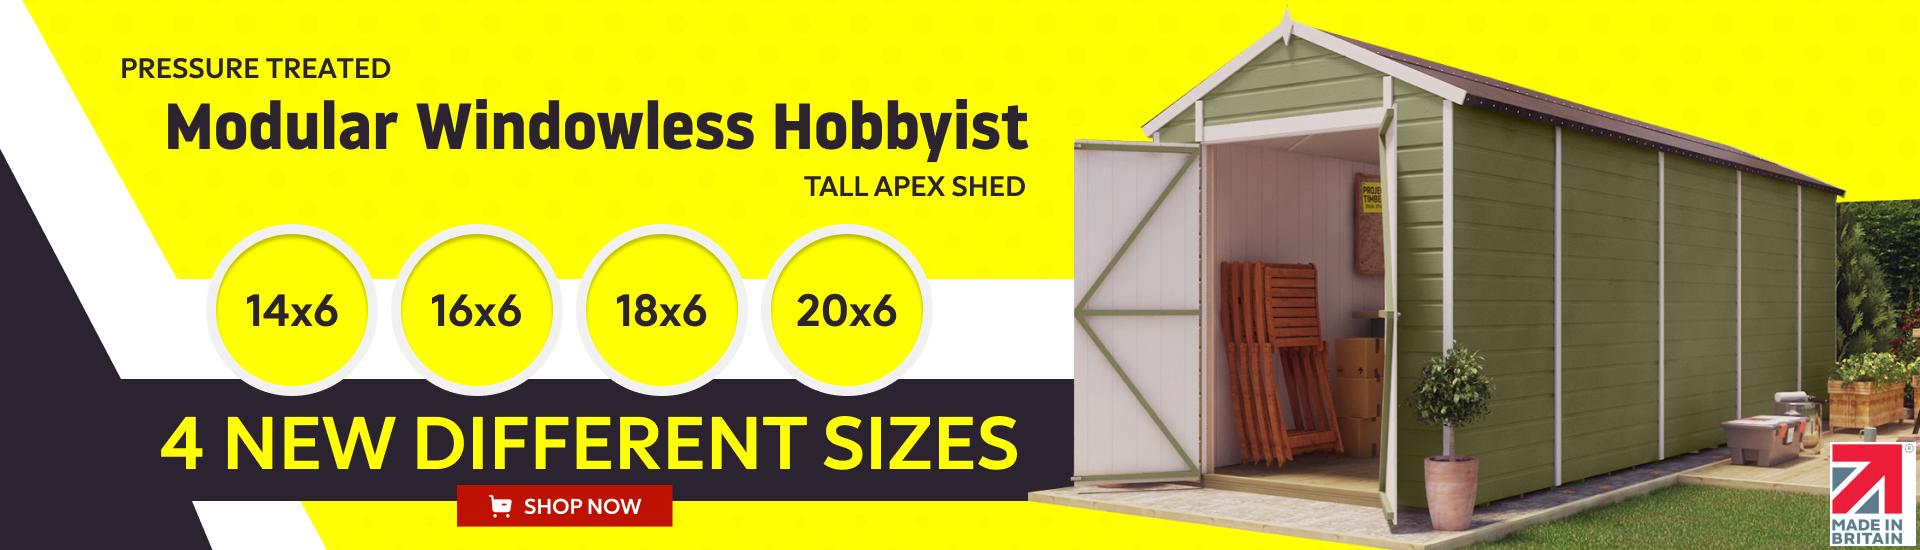 Modular Windowless Hobbyist